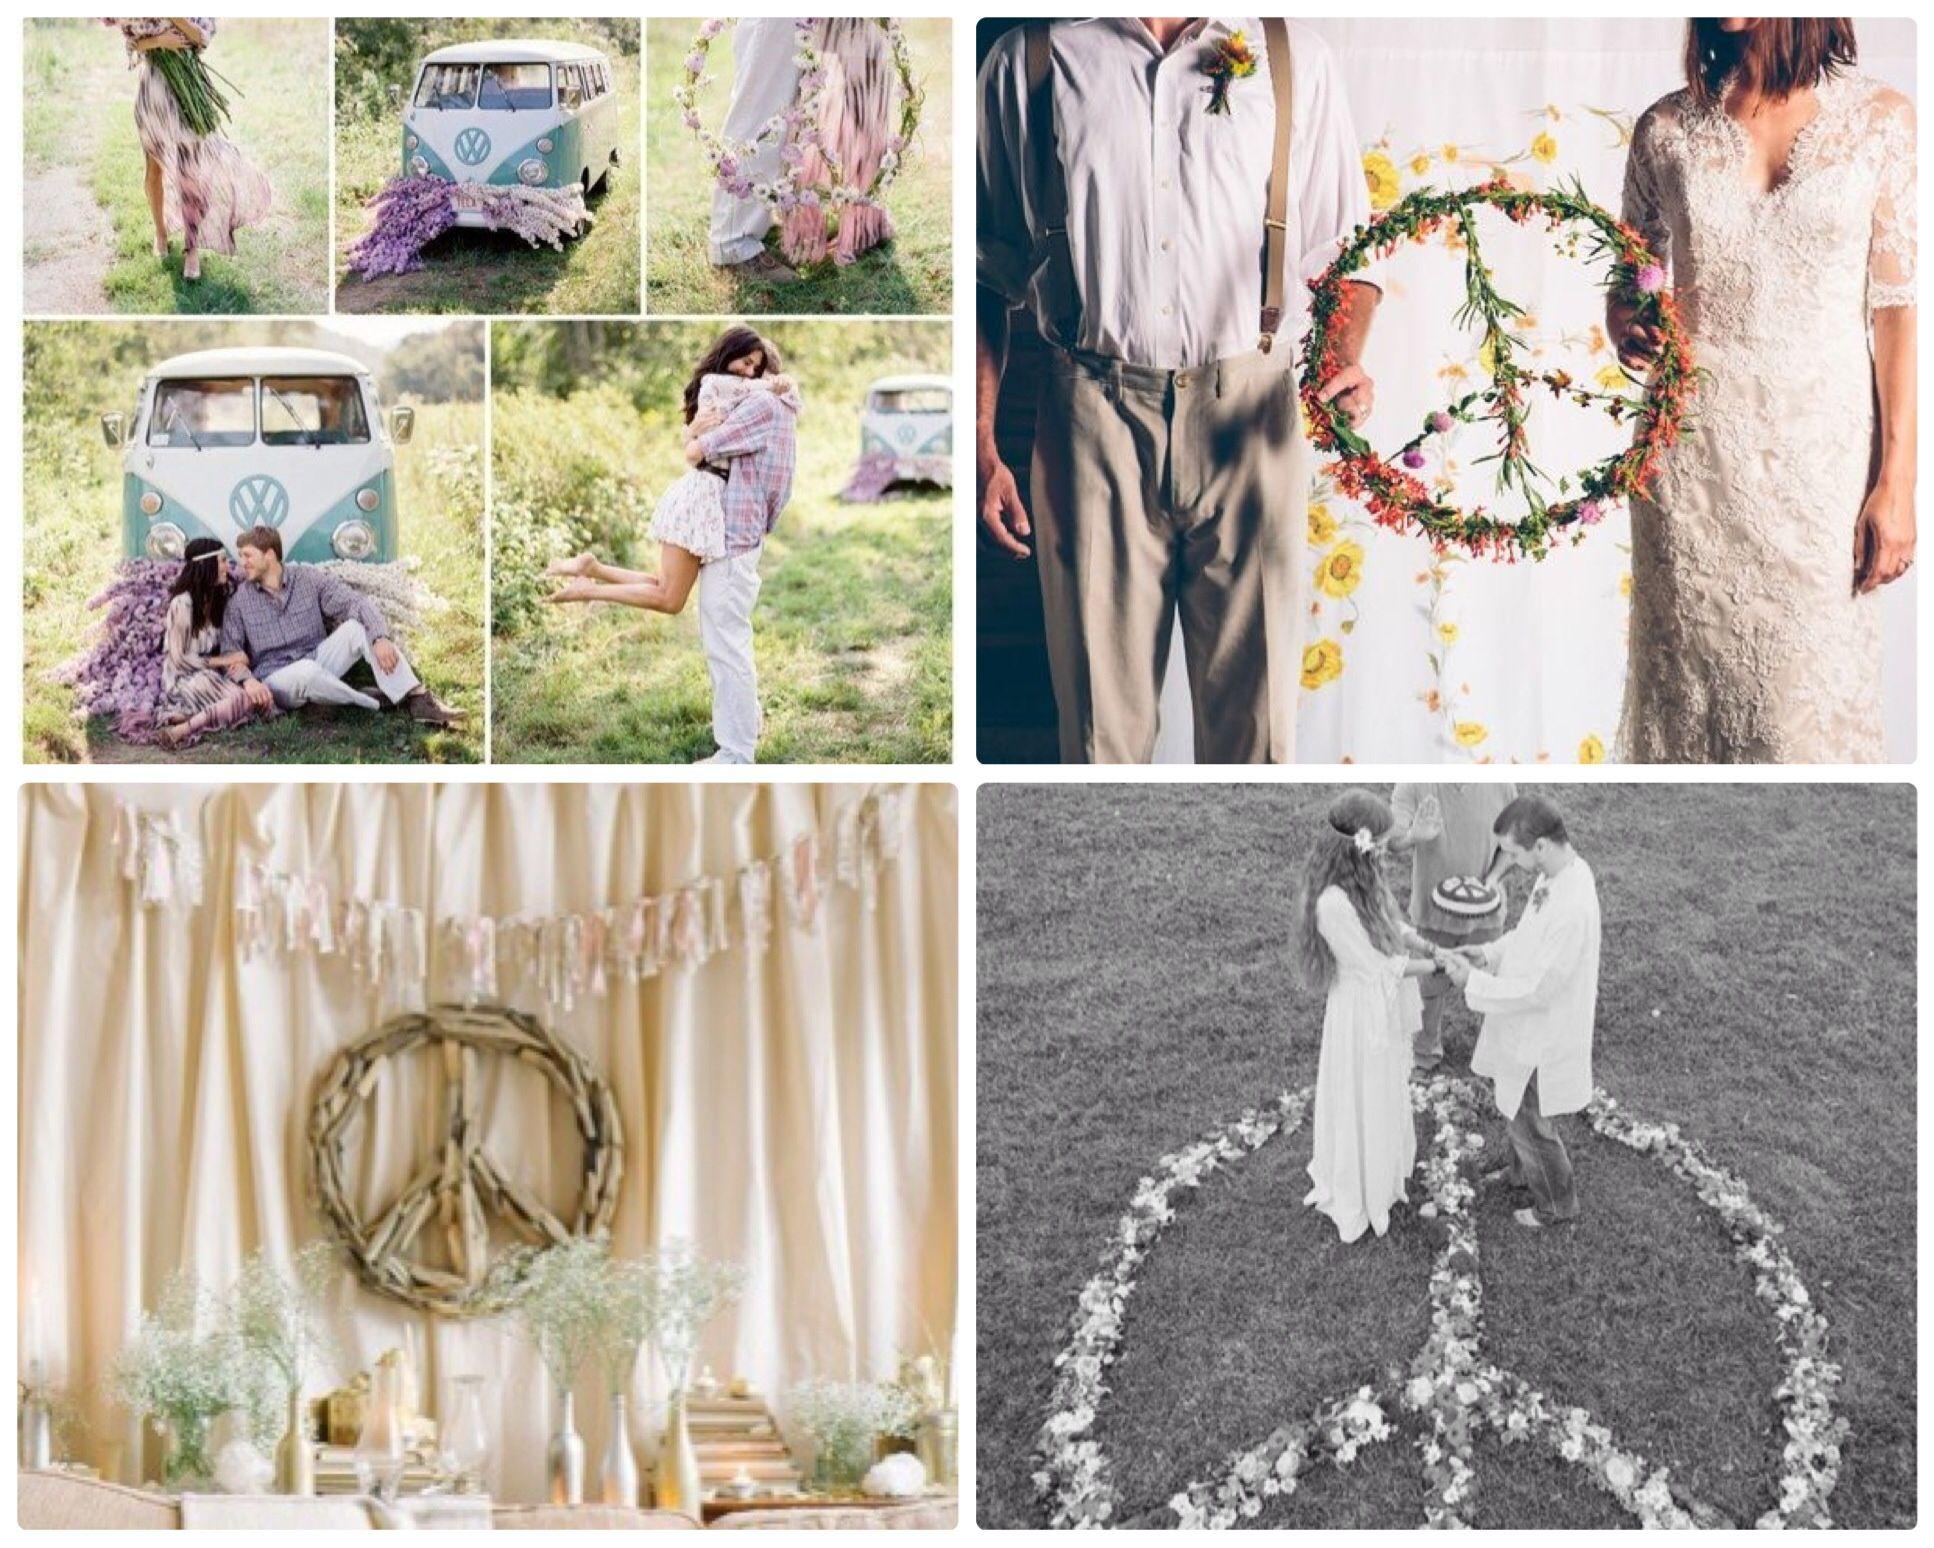 Bodas hippies   boho wedding   Pinterest   Bodas, Wedding ...